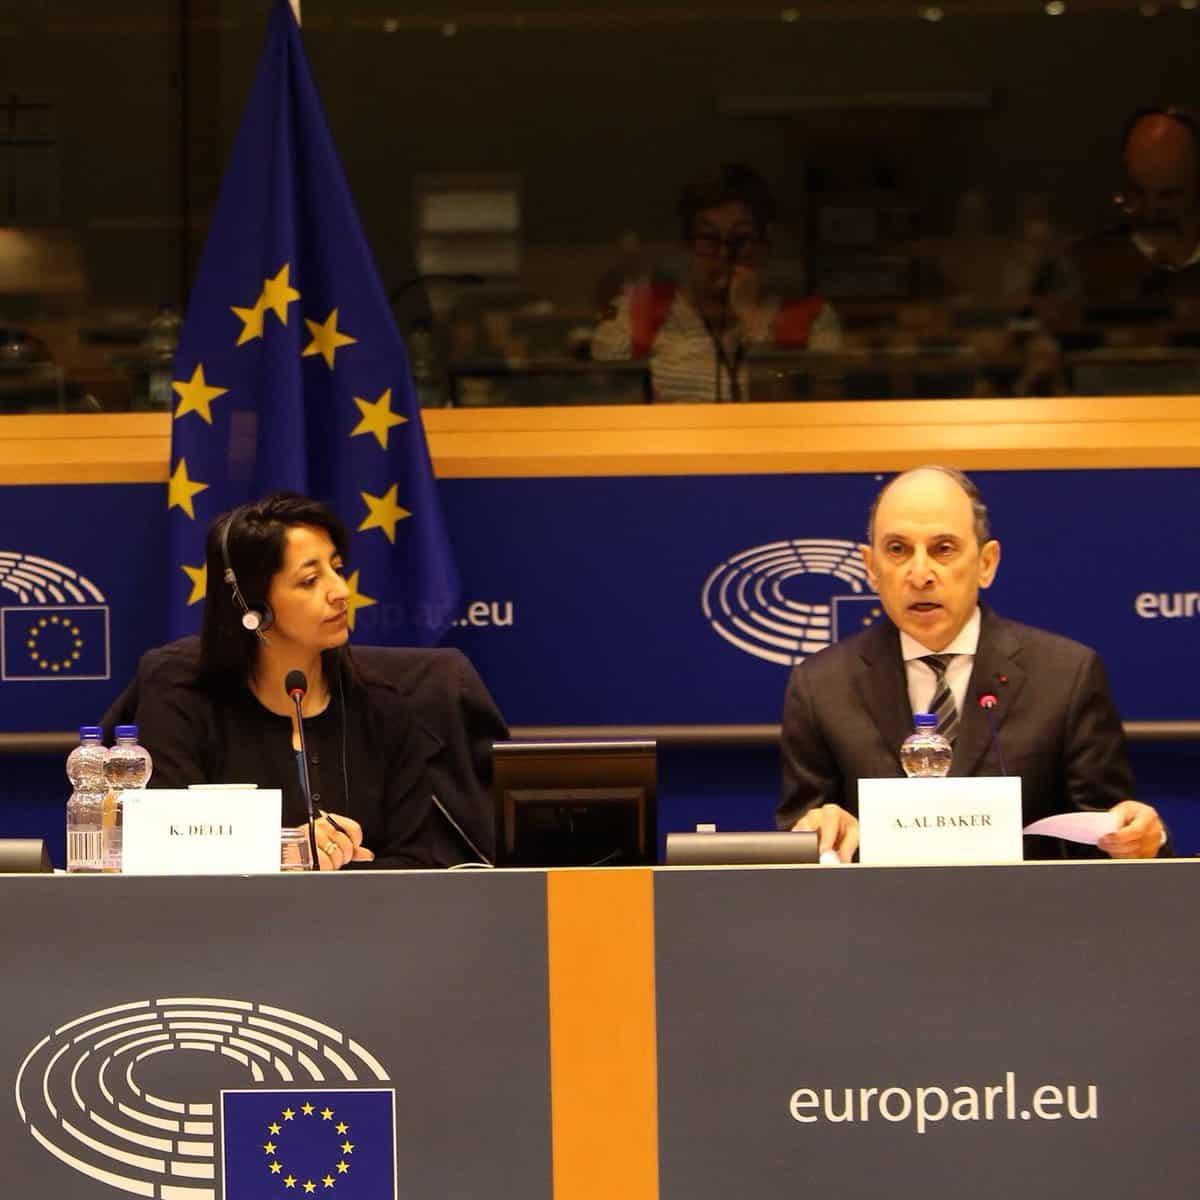 Qatar Airways will spare no effort to develop cooperation with EU